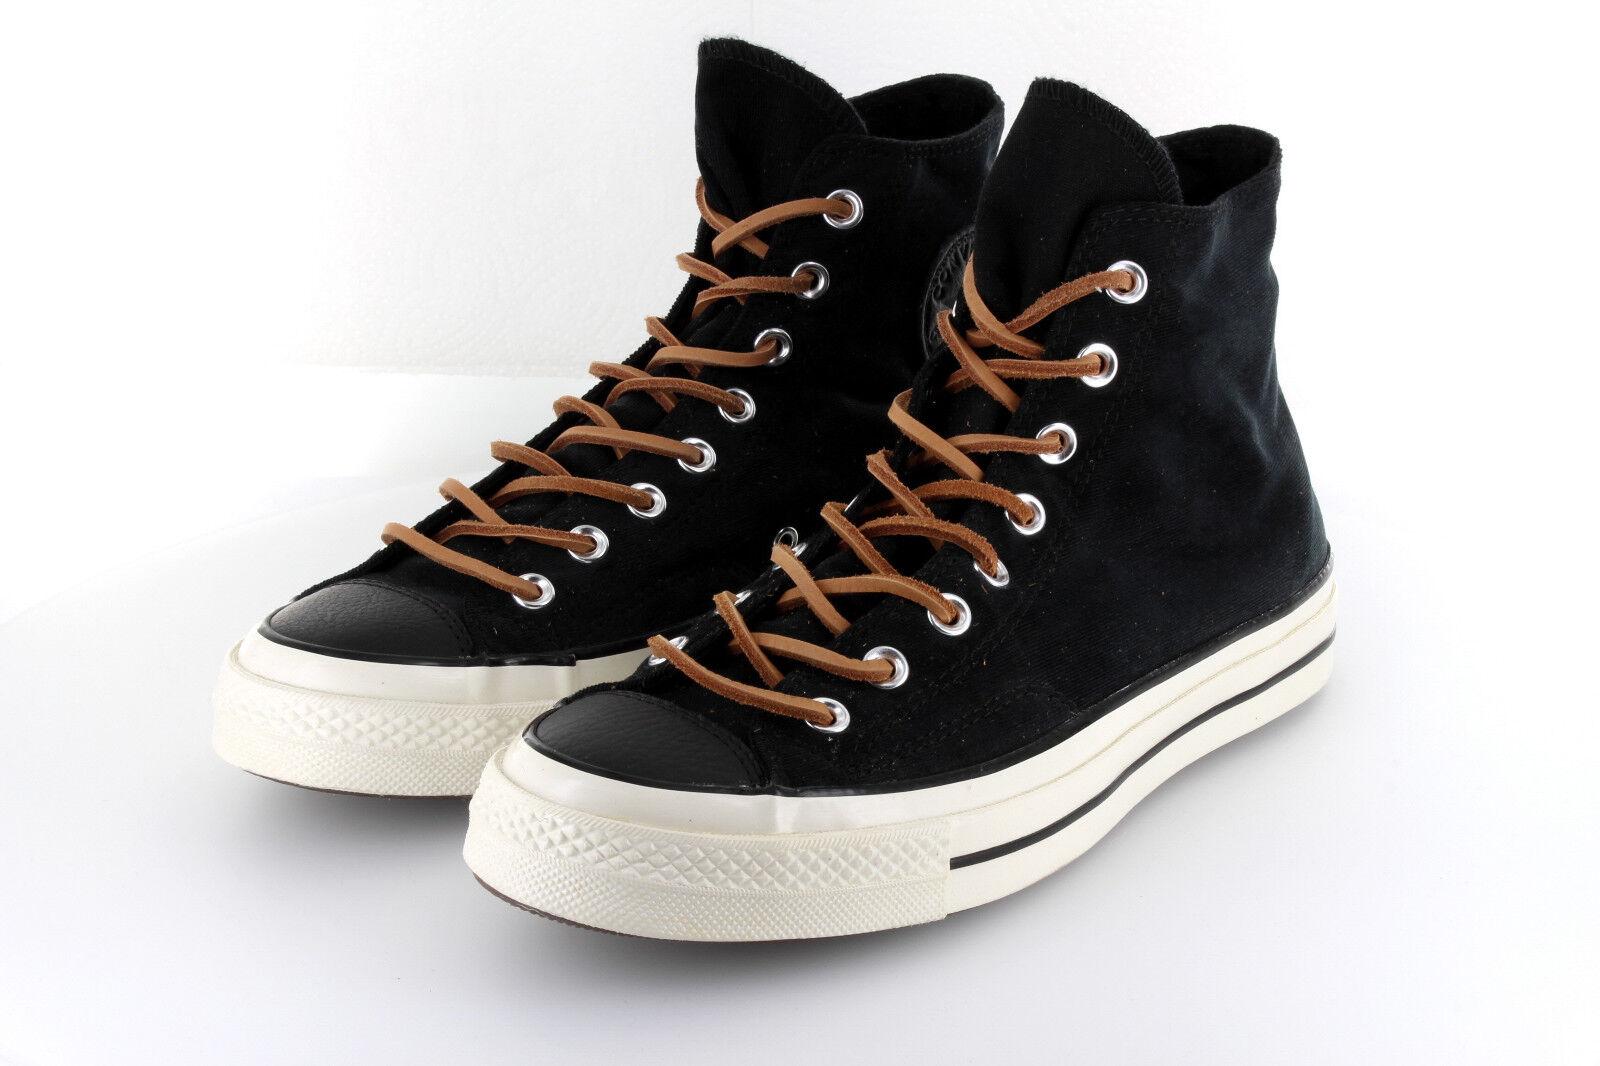 Converse Chuck Taylor AS Hi 70s Black Limited Edition Textile 42,5  43,5 US9